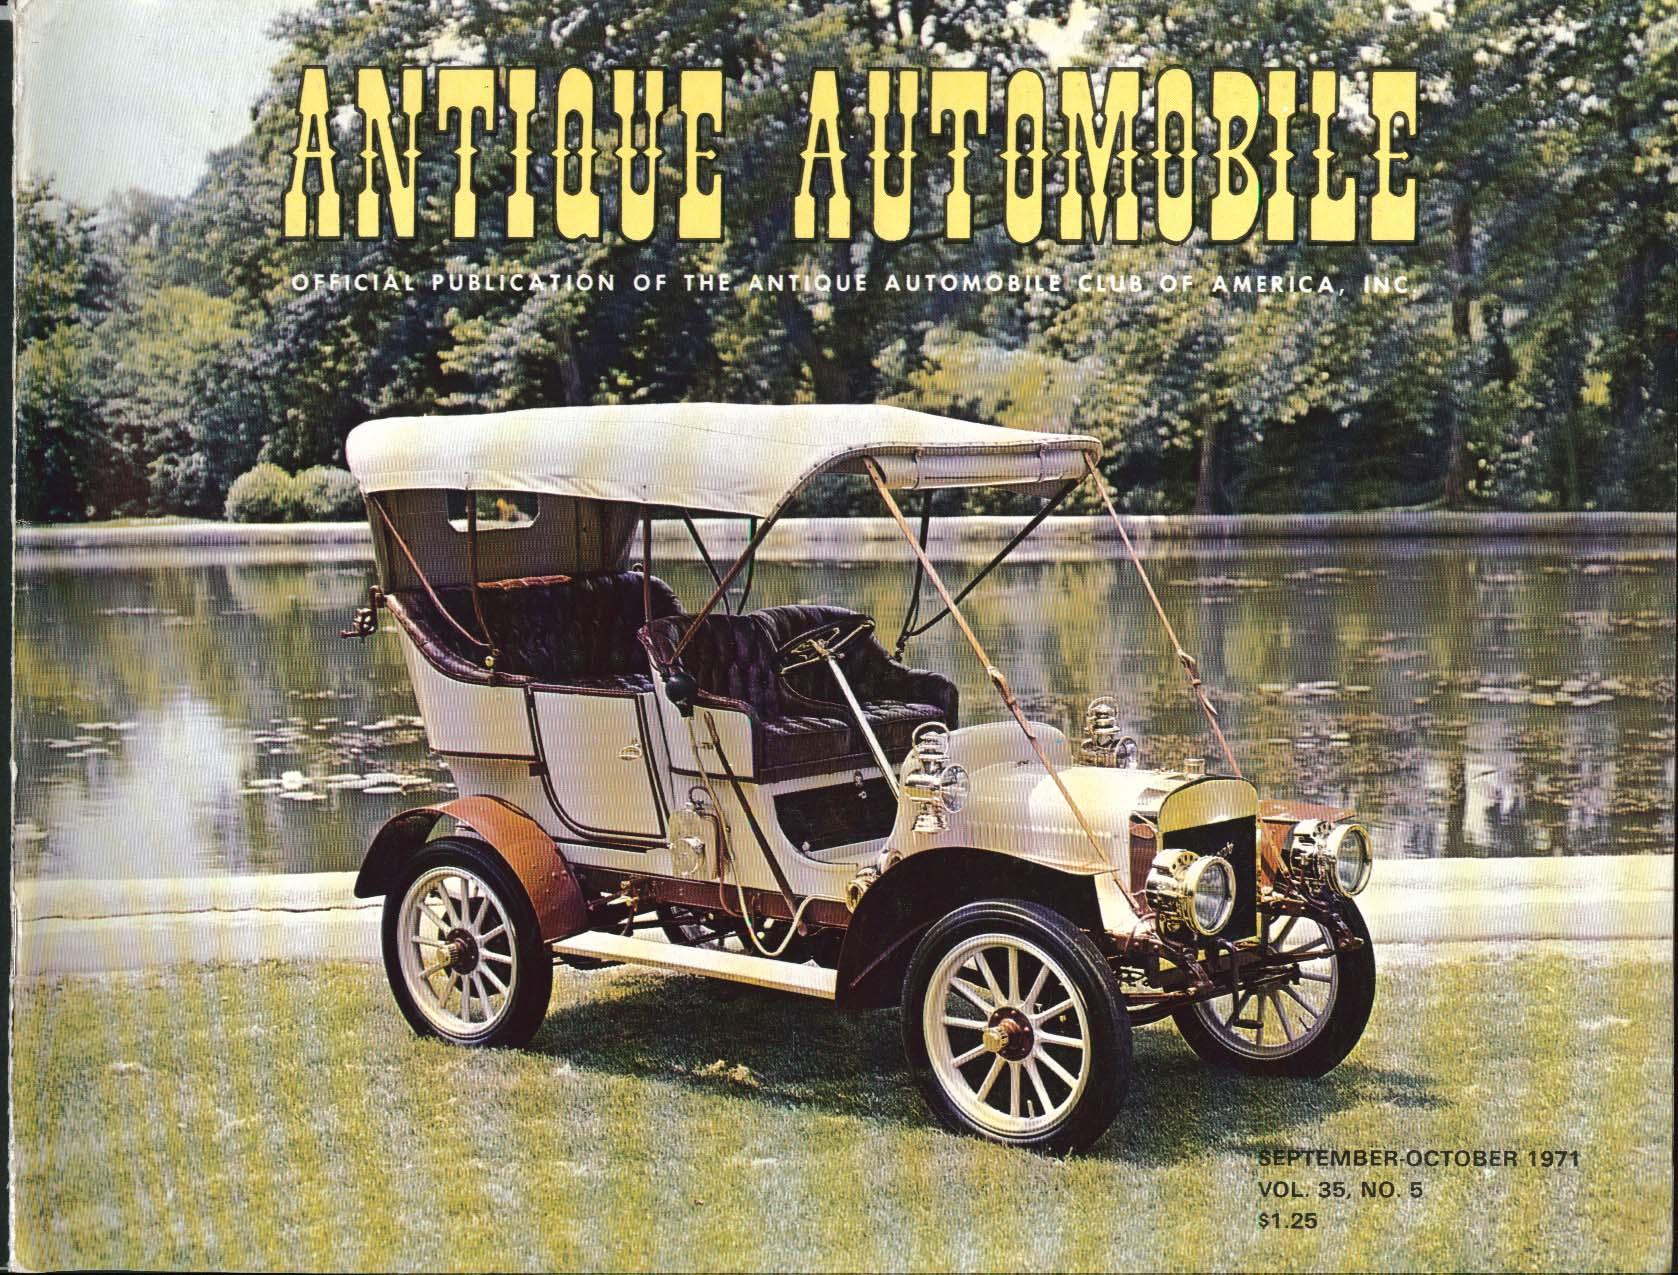 ANTIQUE AUTOMOBILE Trifon Special AACA National Spring Meet Detroiter 9/10 1971